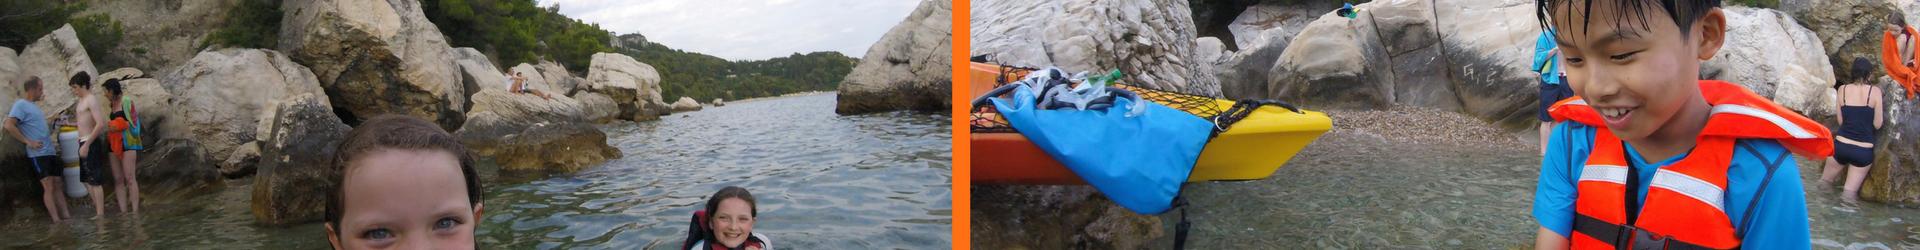 Split sea kayaking